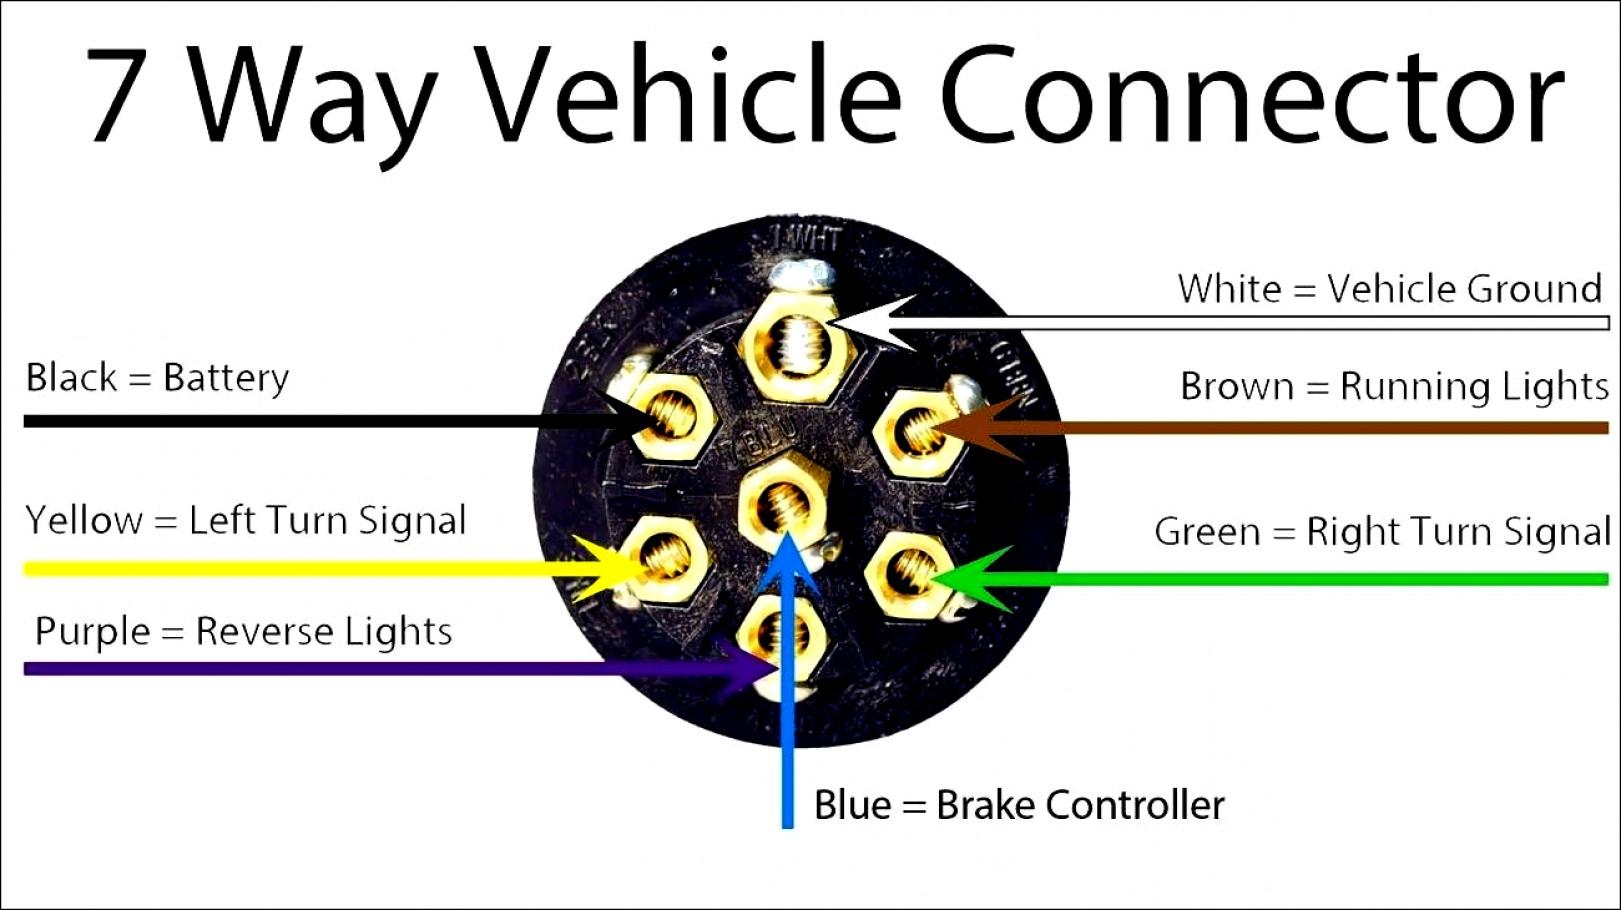 7 Round Trailer Wiring Diagram - Wiring Diagrams Hubs - Trailer Light Wiring Diagram 7 Way